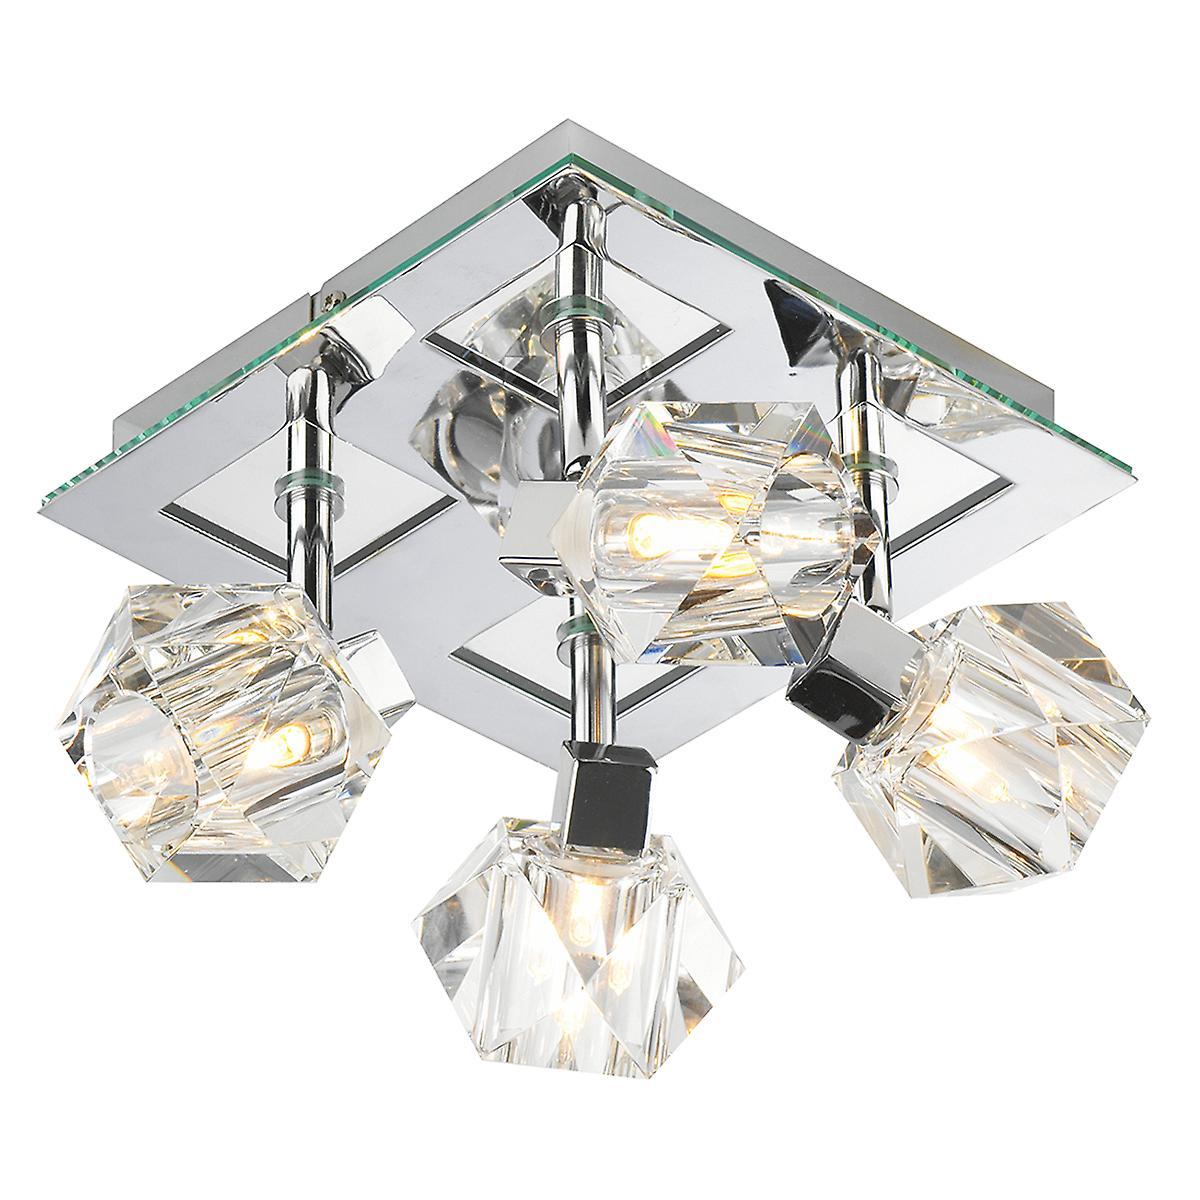 Dar GEO8550 Geo Square Halogen Flush Ceiling Light